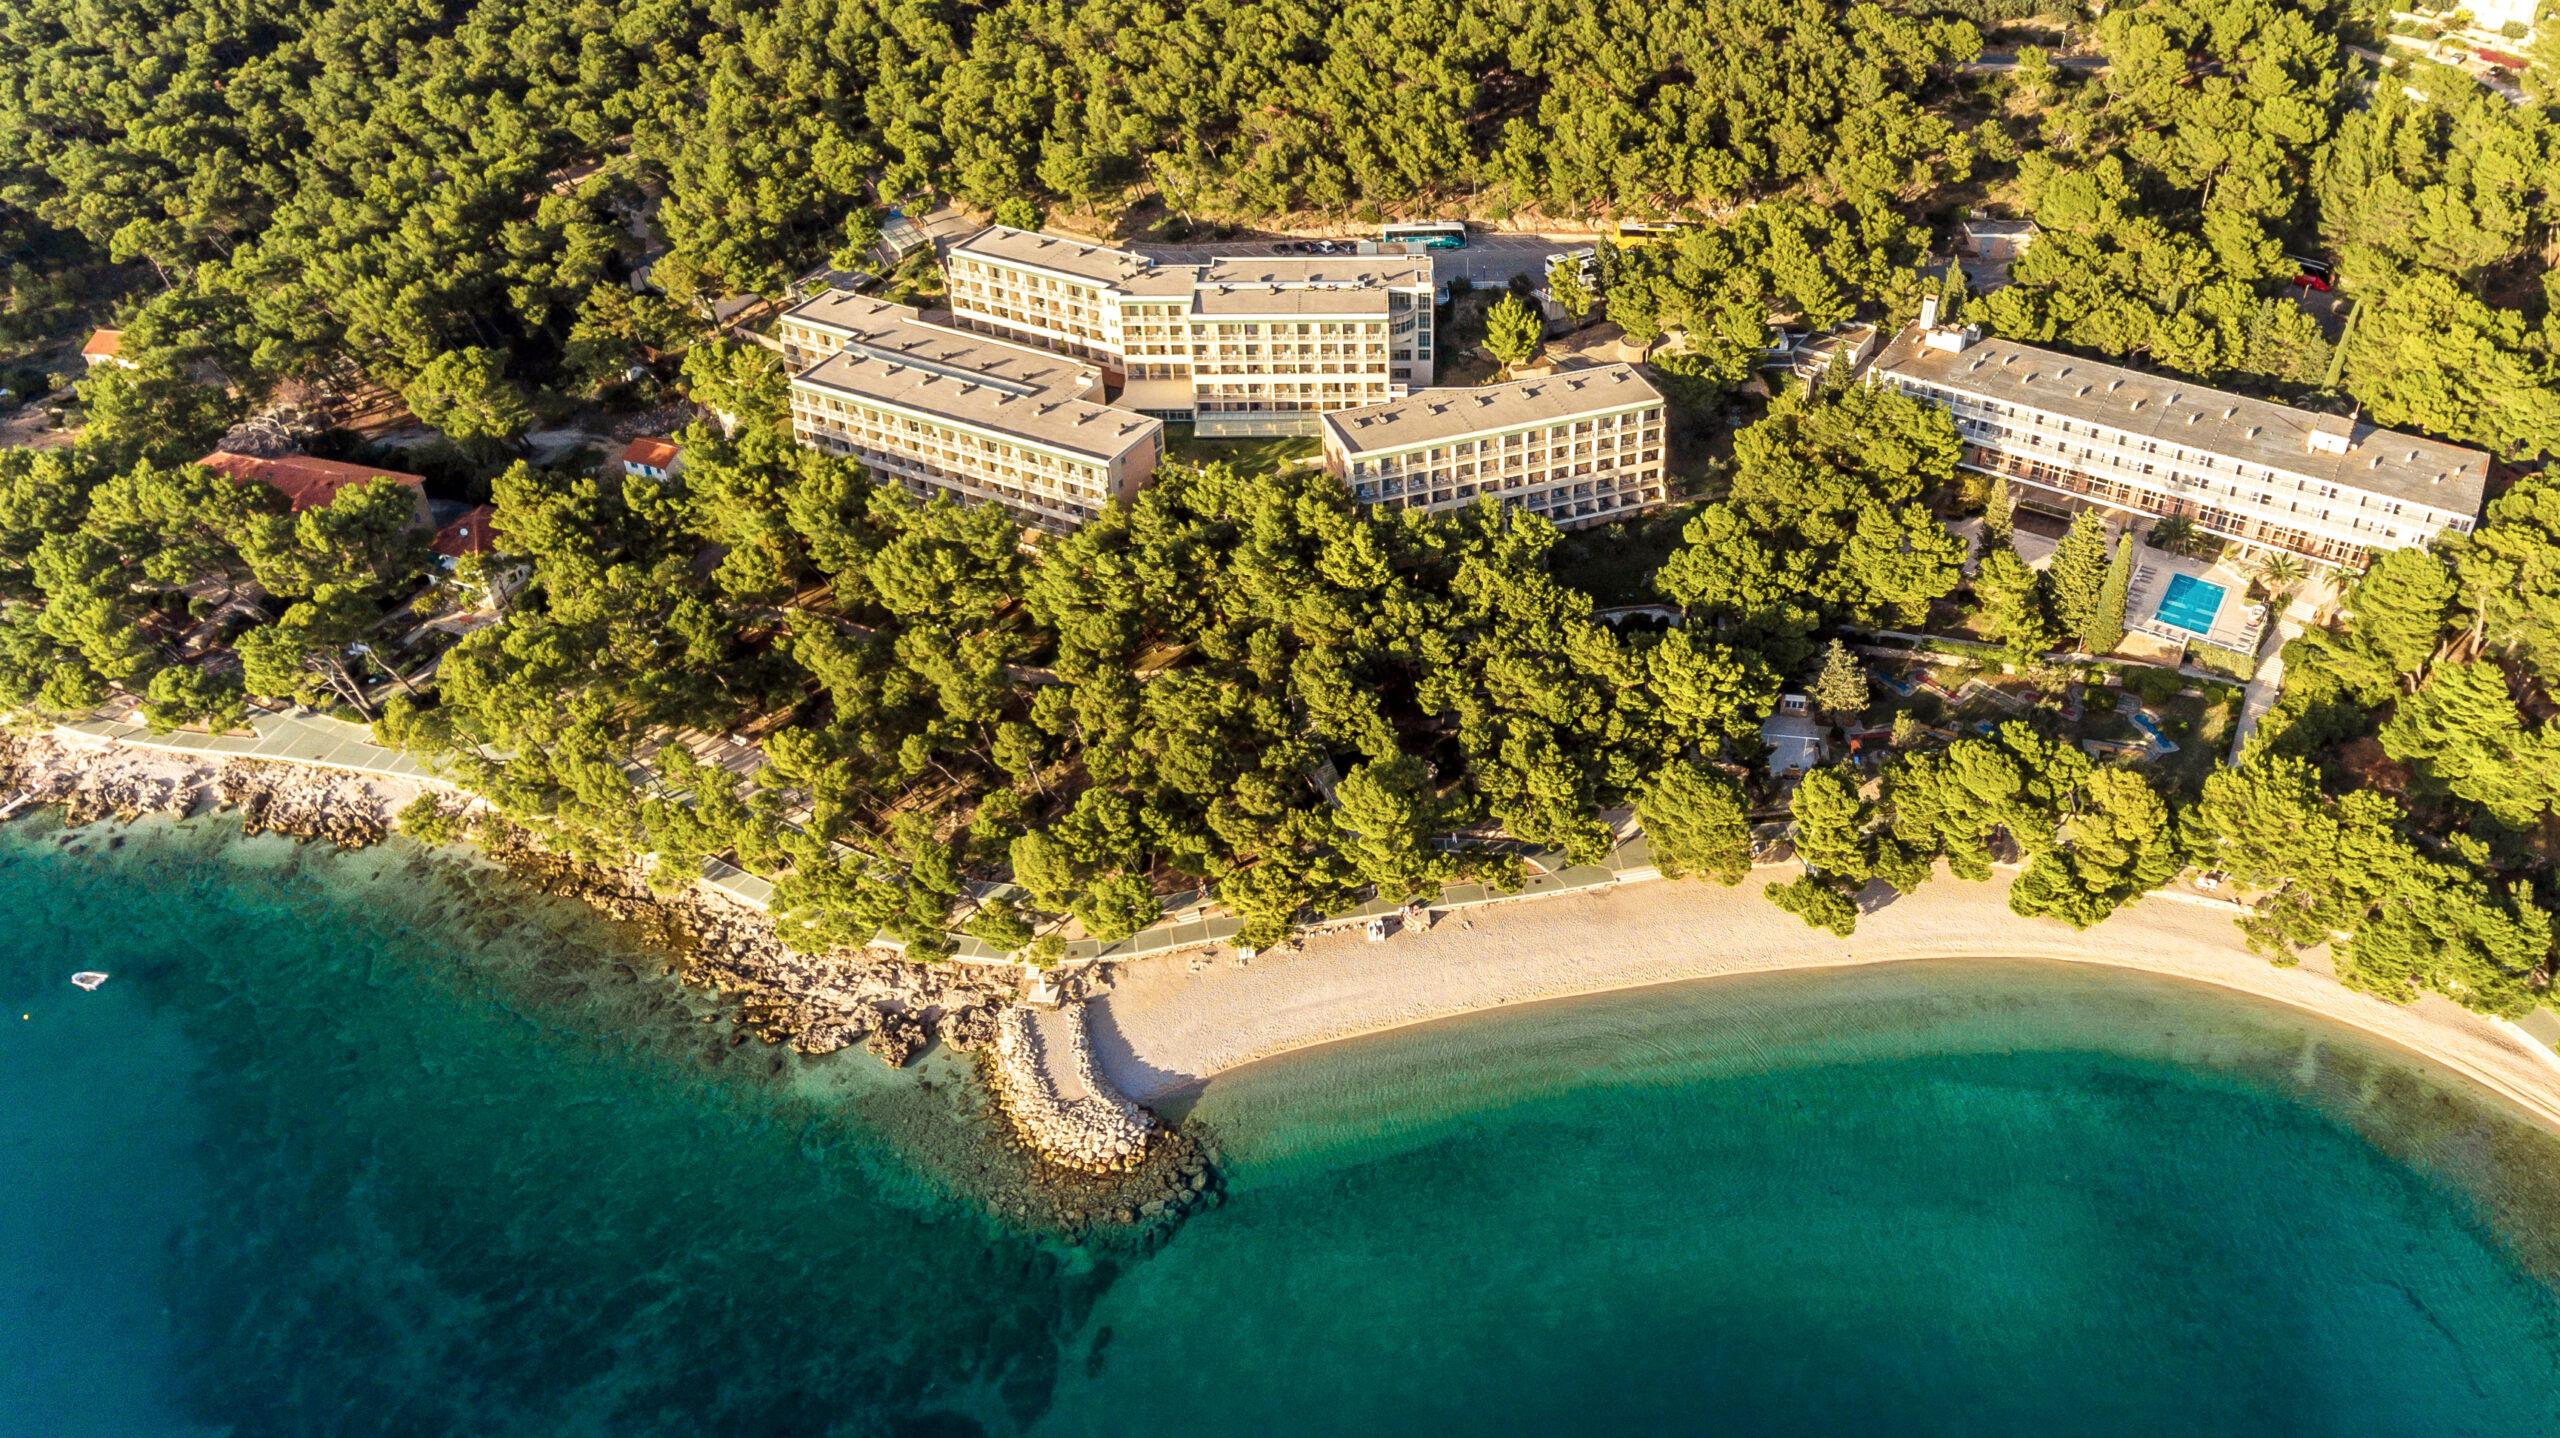 Bluesun Hotel Marina - aerial views (4)